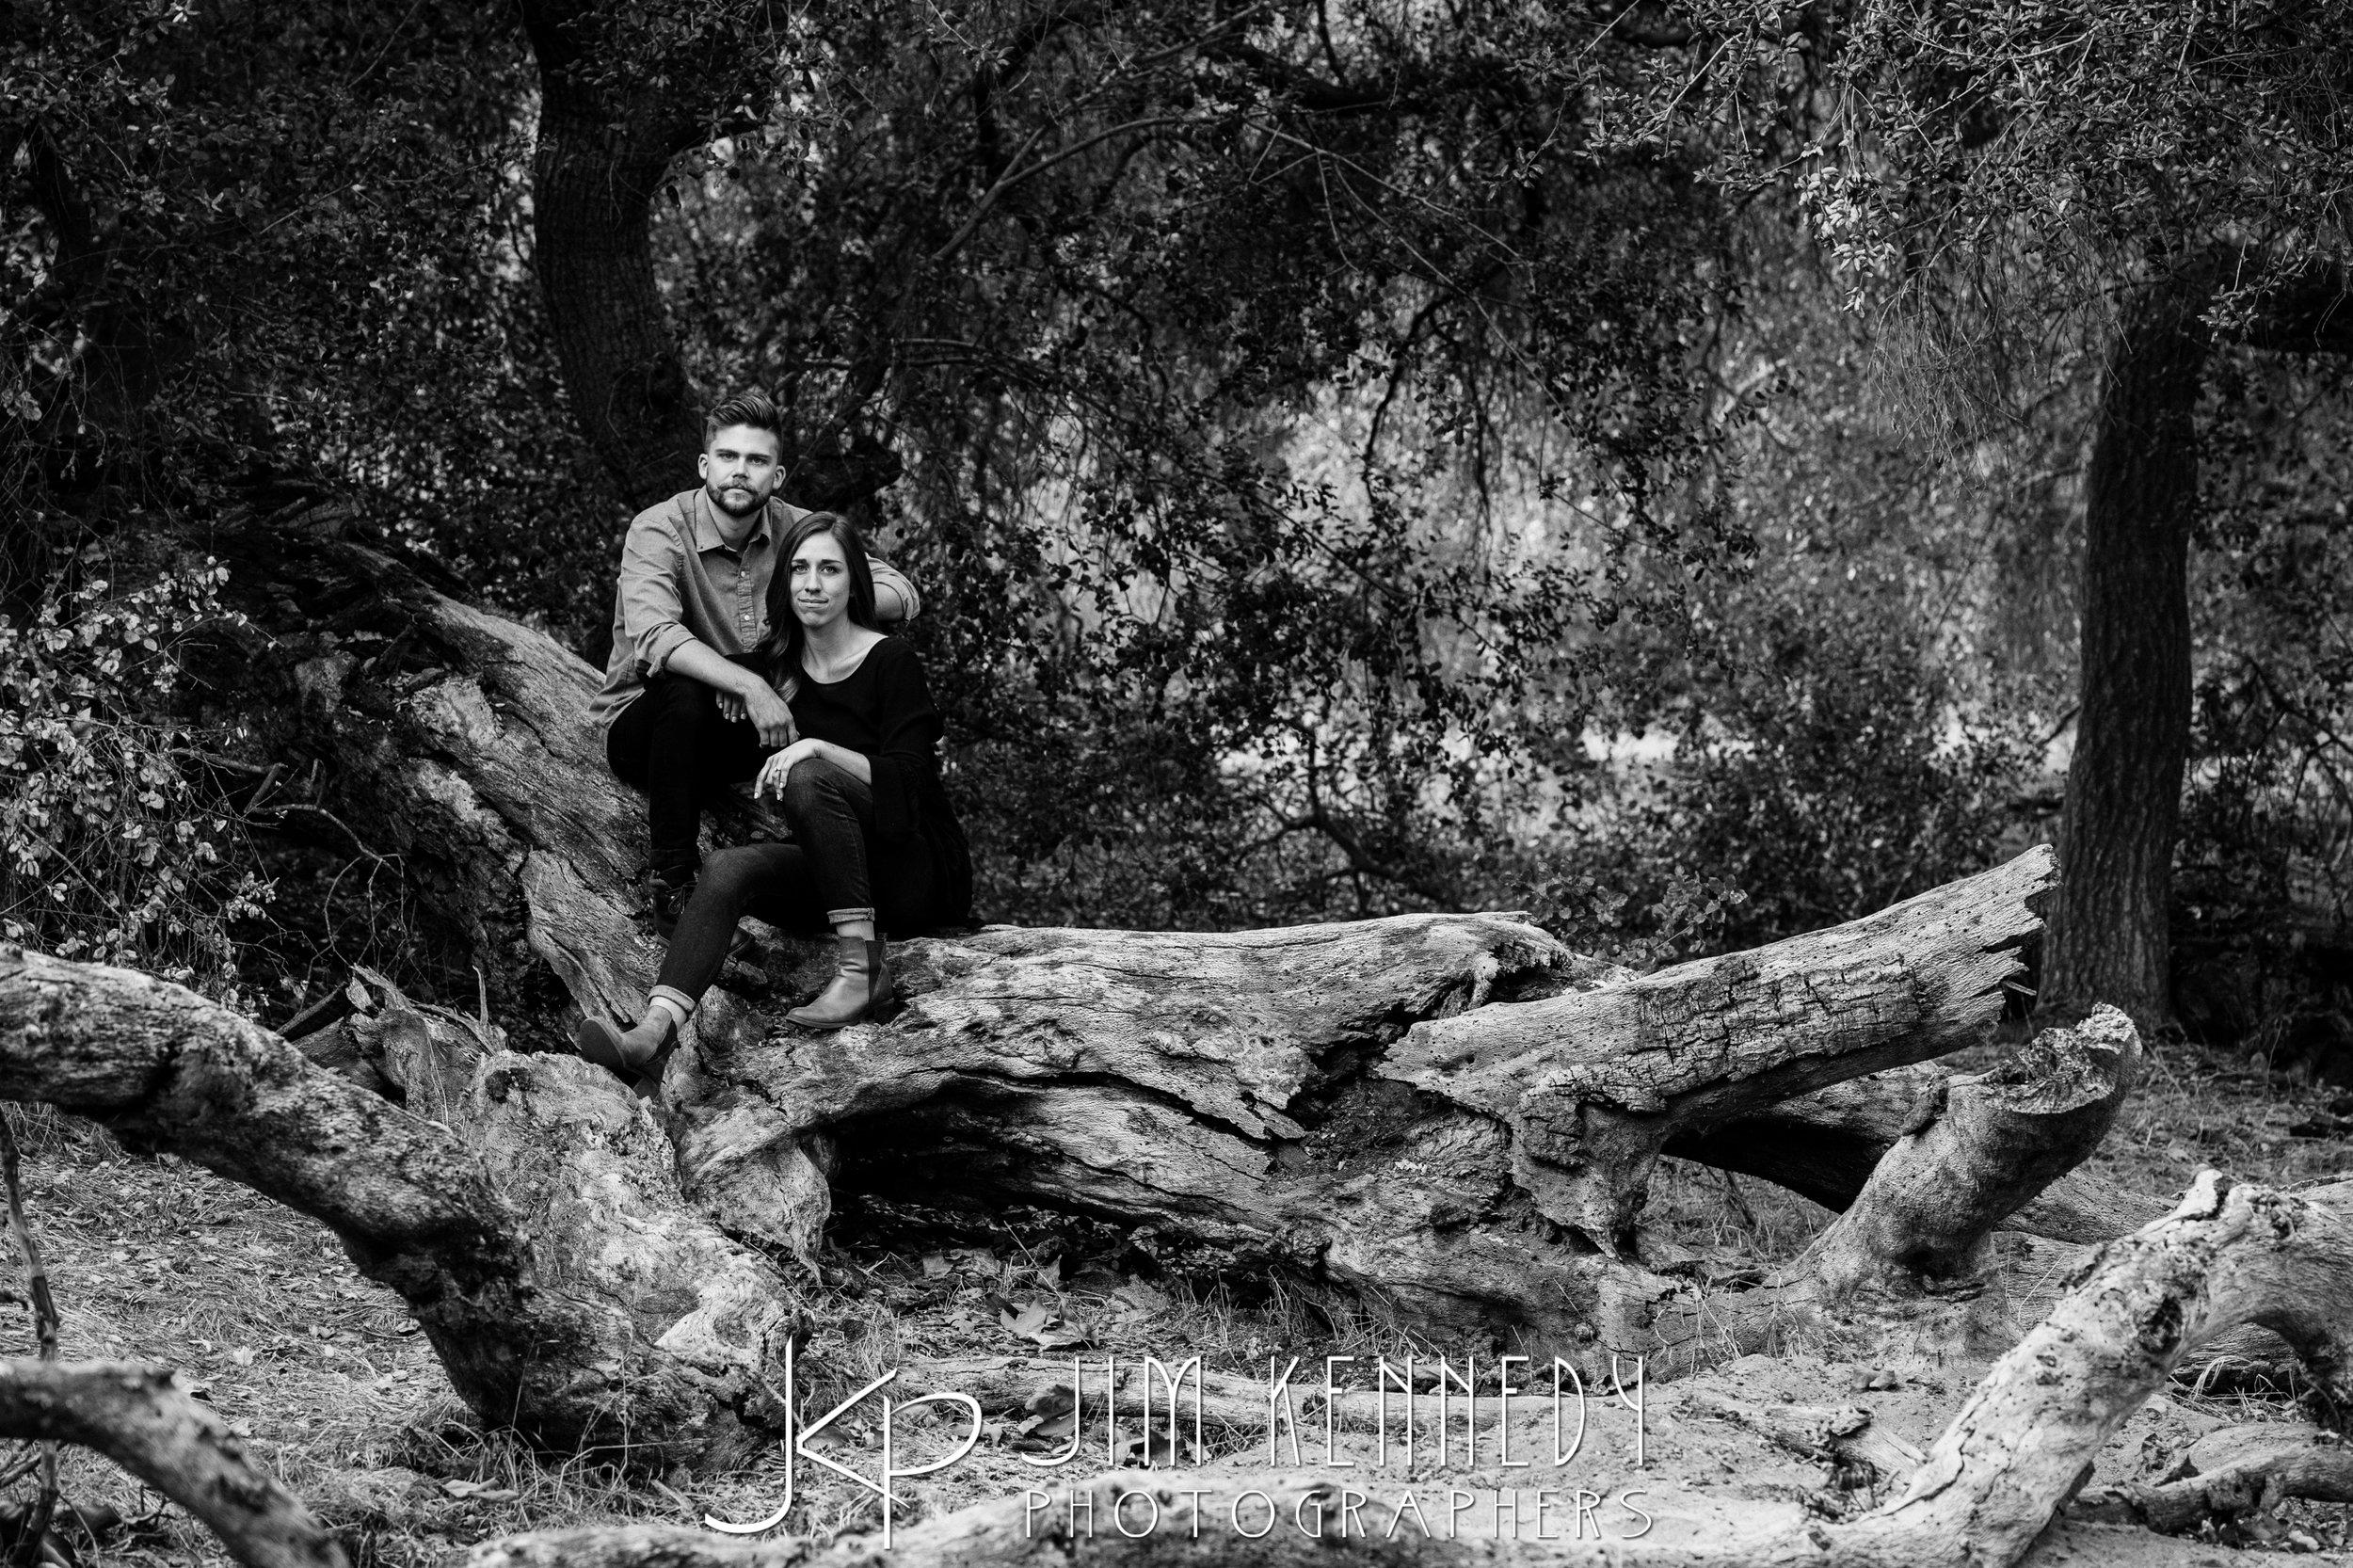 thomas-f-riley-wilderness-park-engagement-session-Leah-tyler_0017.JPG